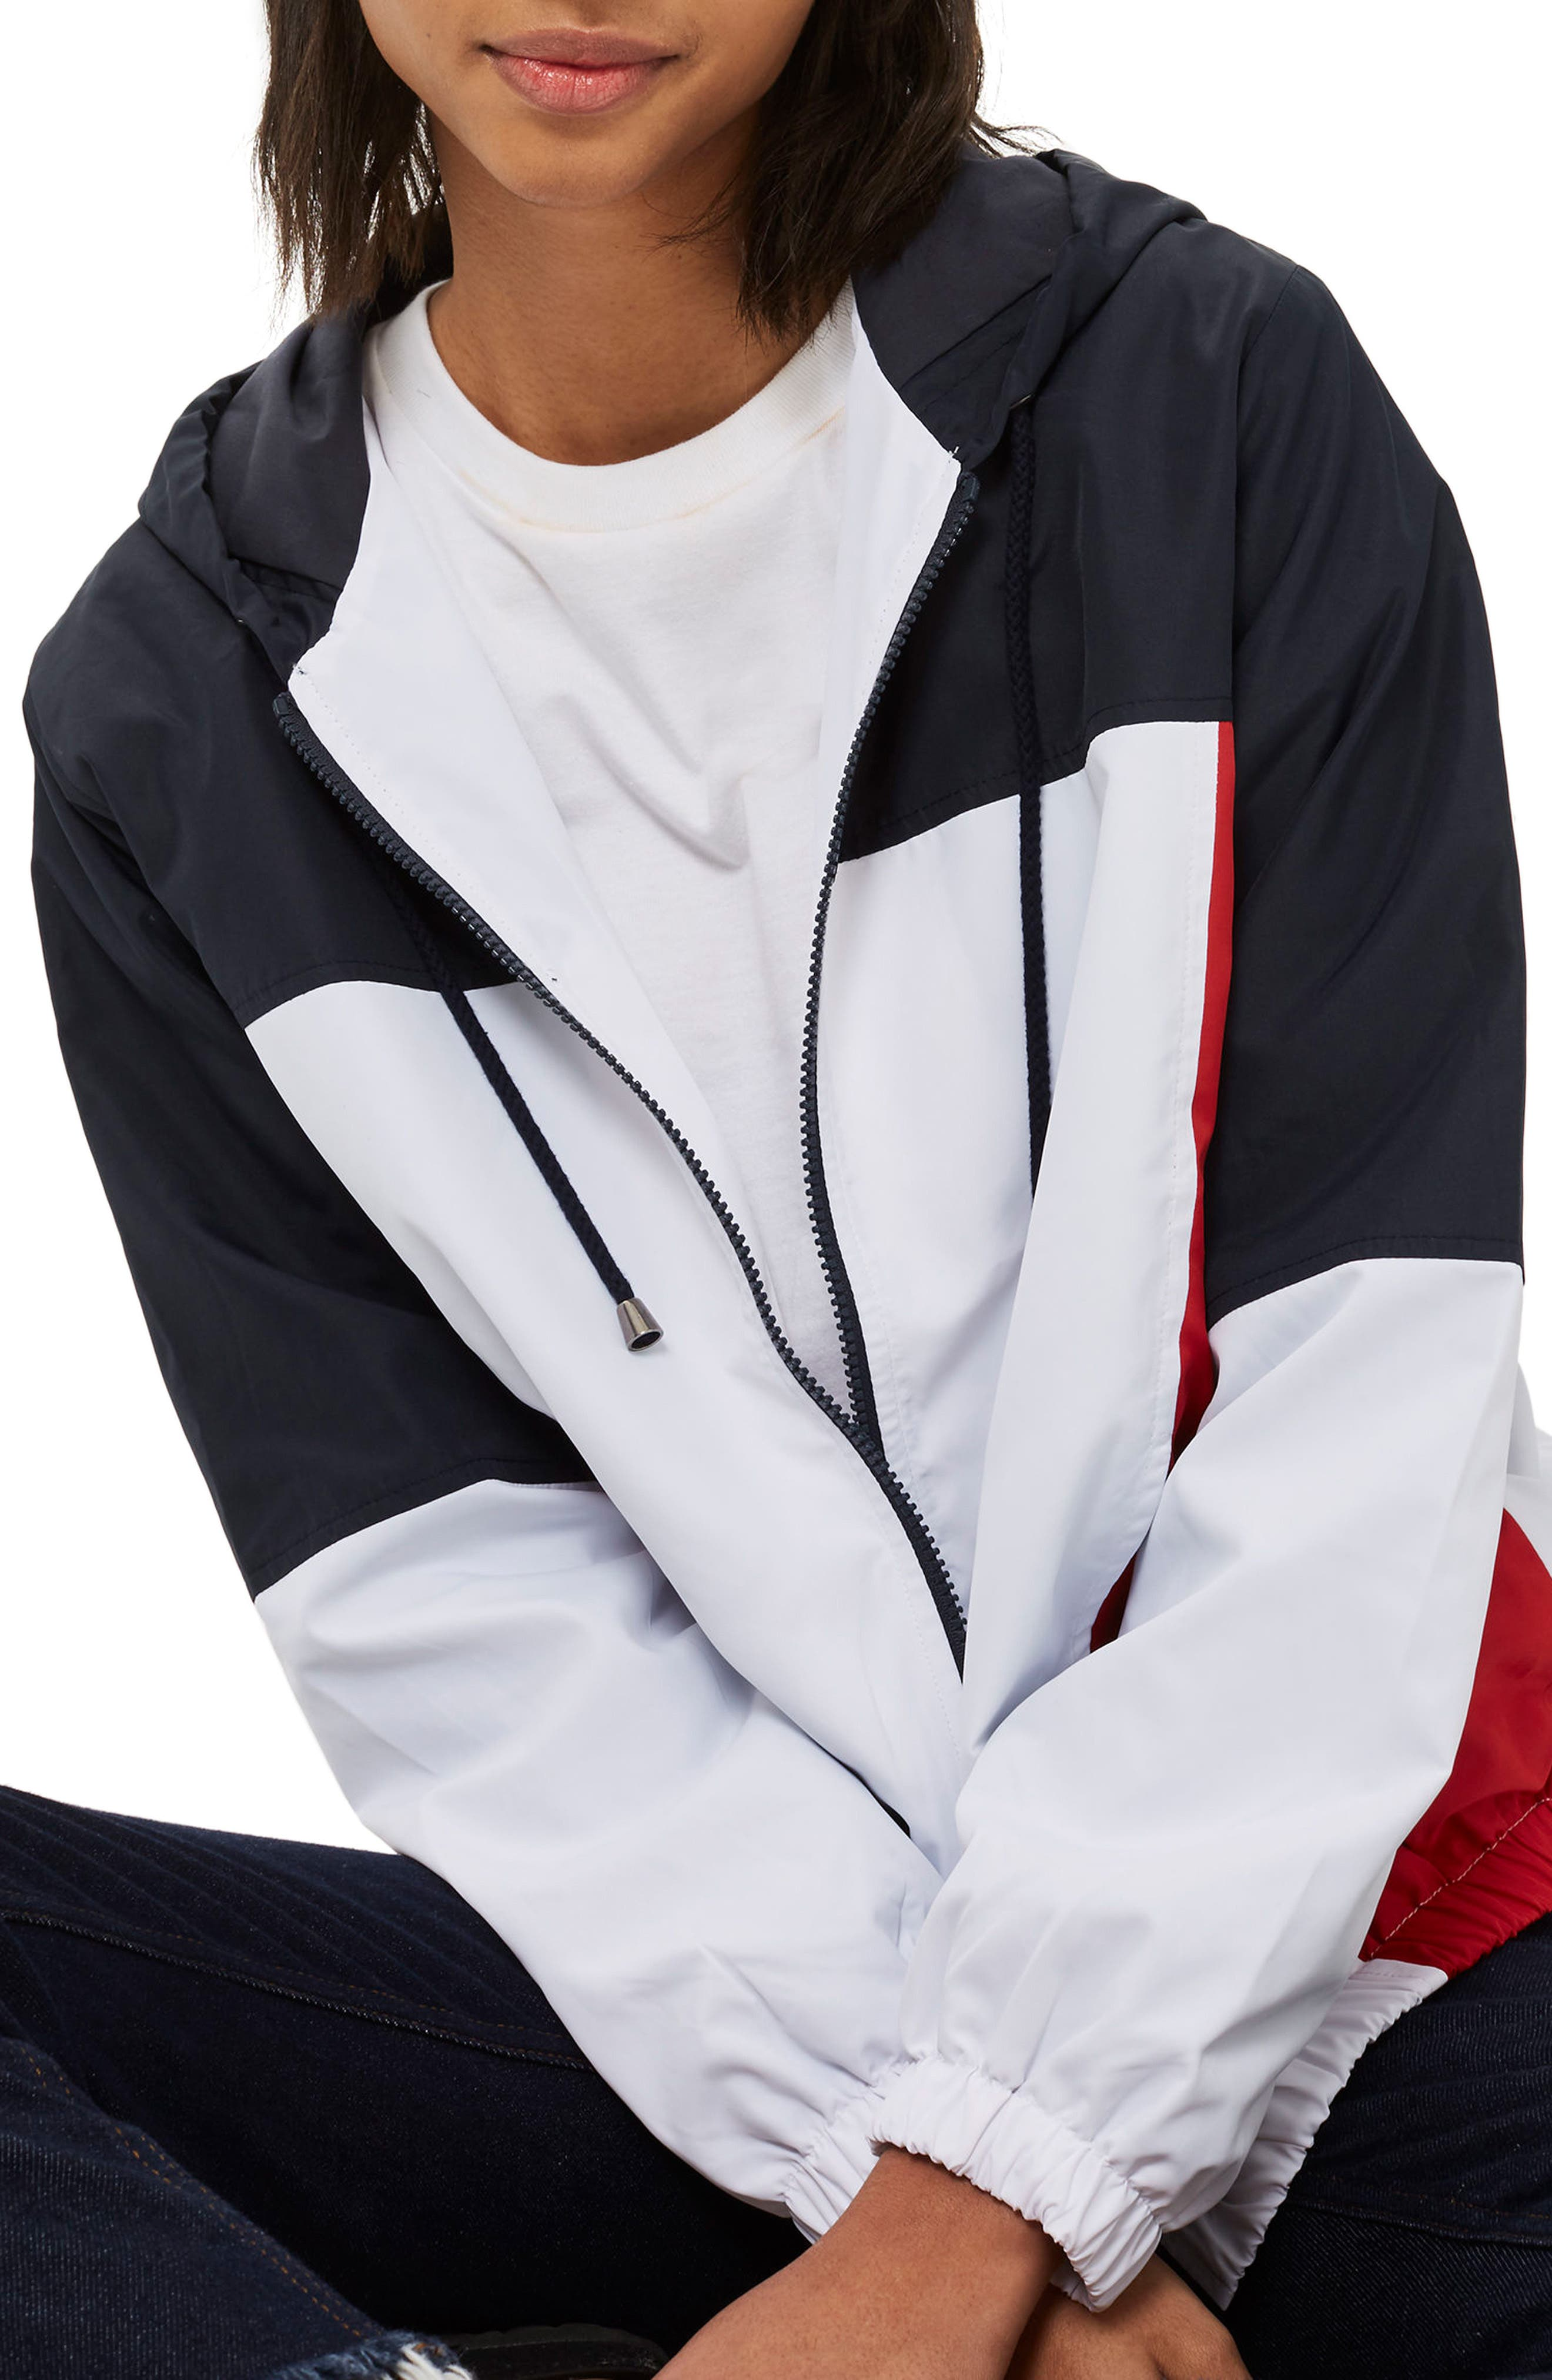 Colorblock Windbreaker Jacket,                             Alternate thumbnail 3, color,                             100